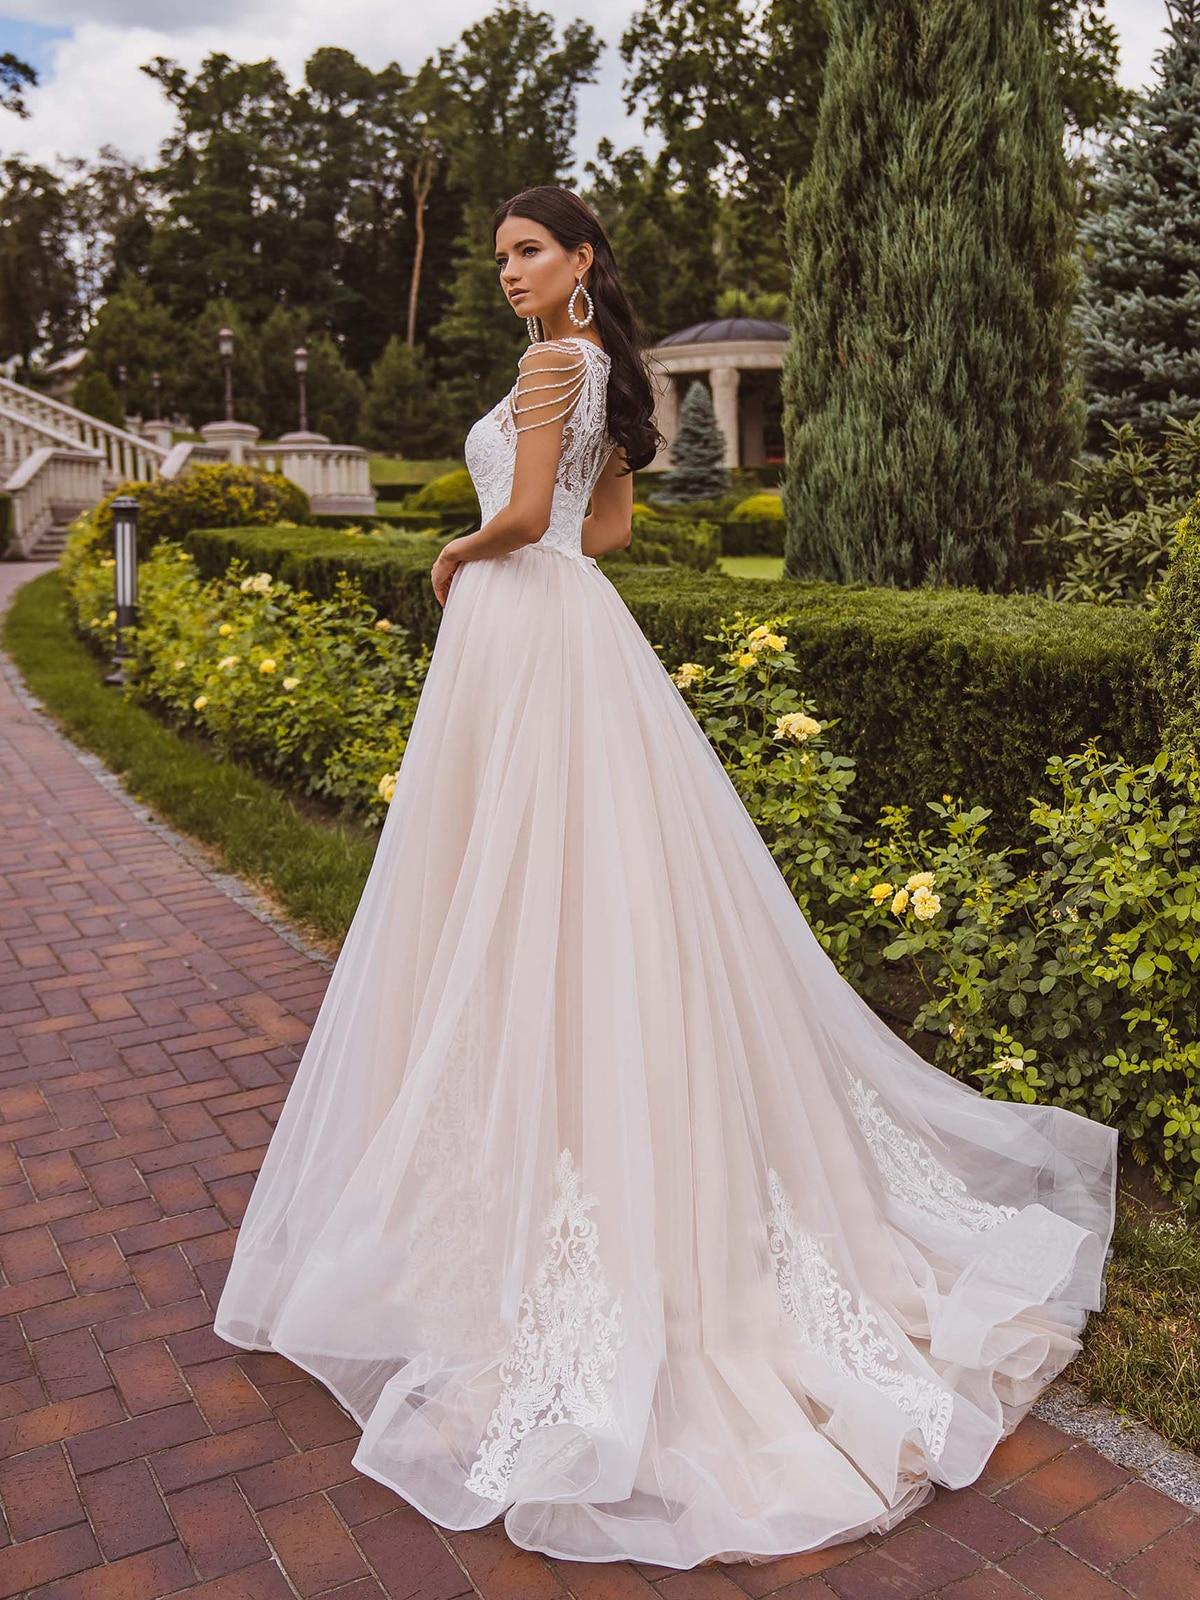 Get Halter Applique Lace Bead Outdoor Wedding Dress Tassels 2021 Blush Pink Photography Bridal Gown Custom Made Vestido De Noiva